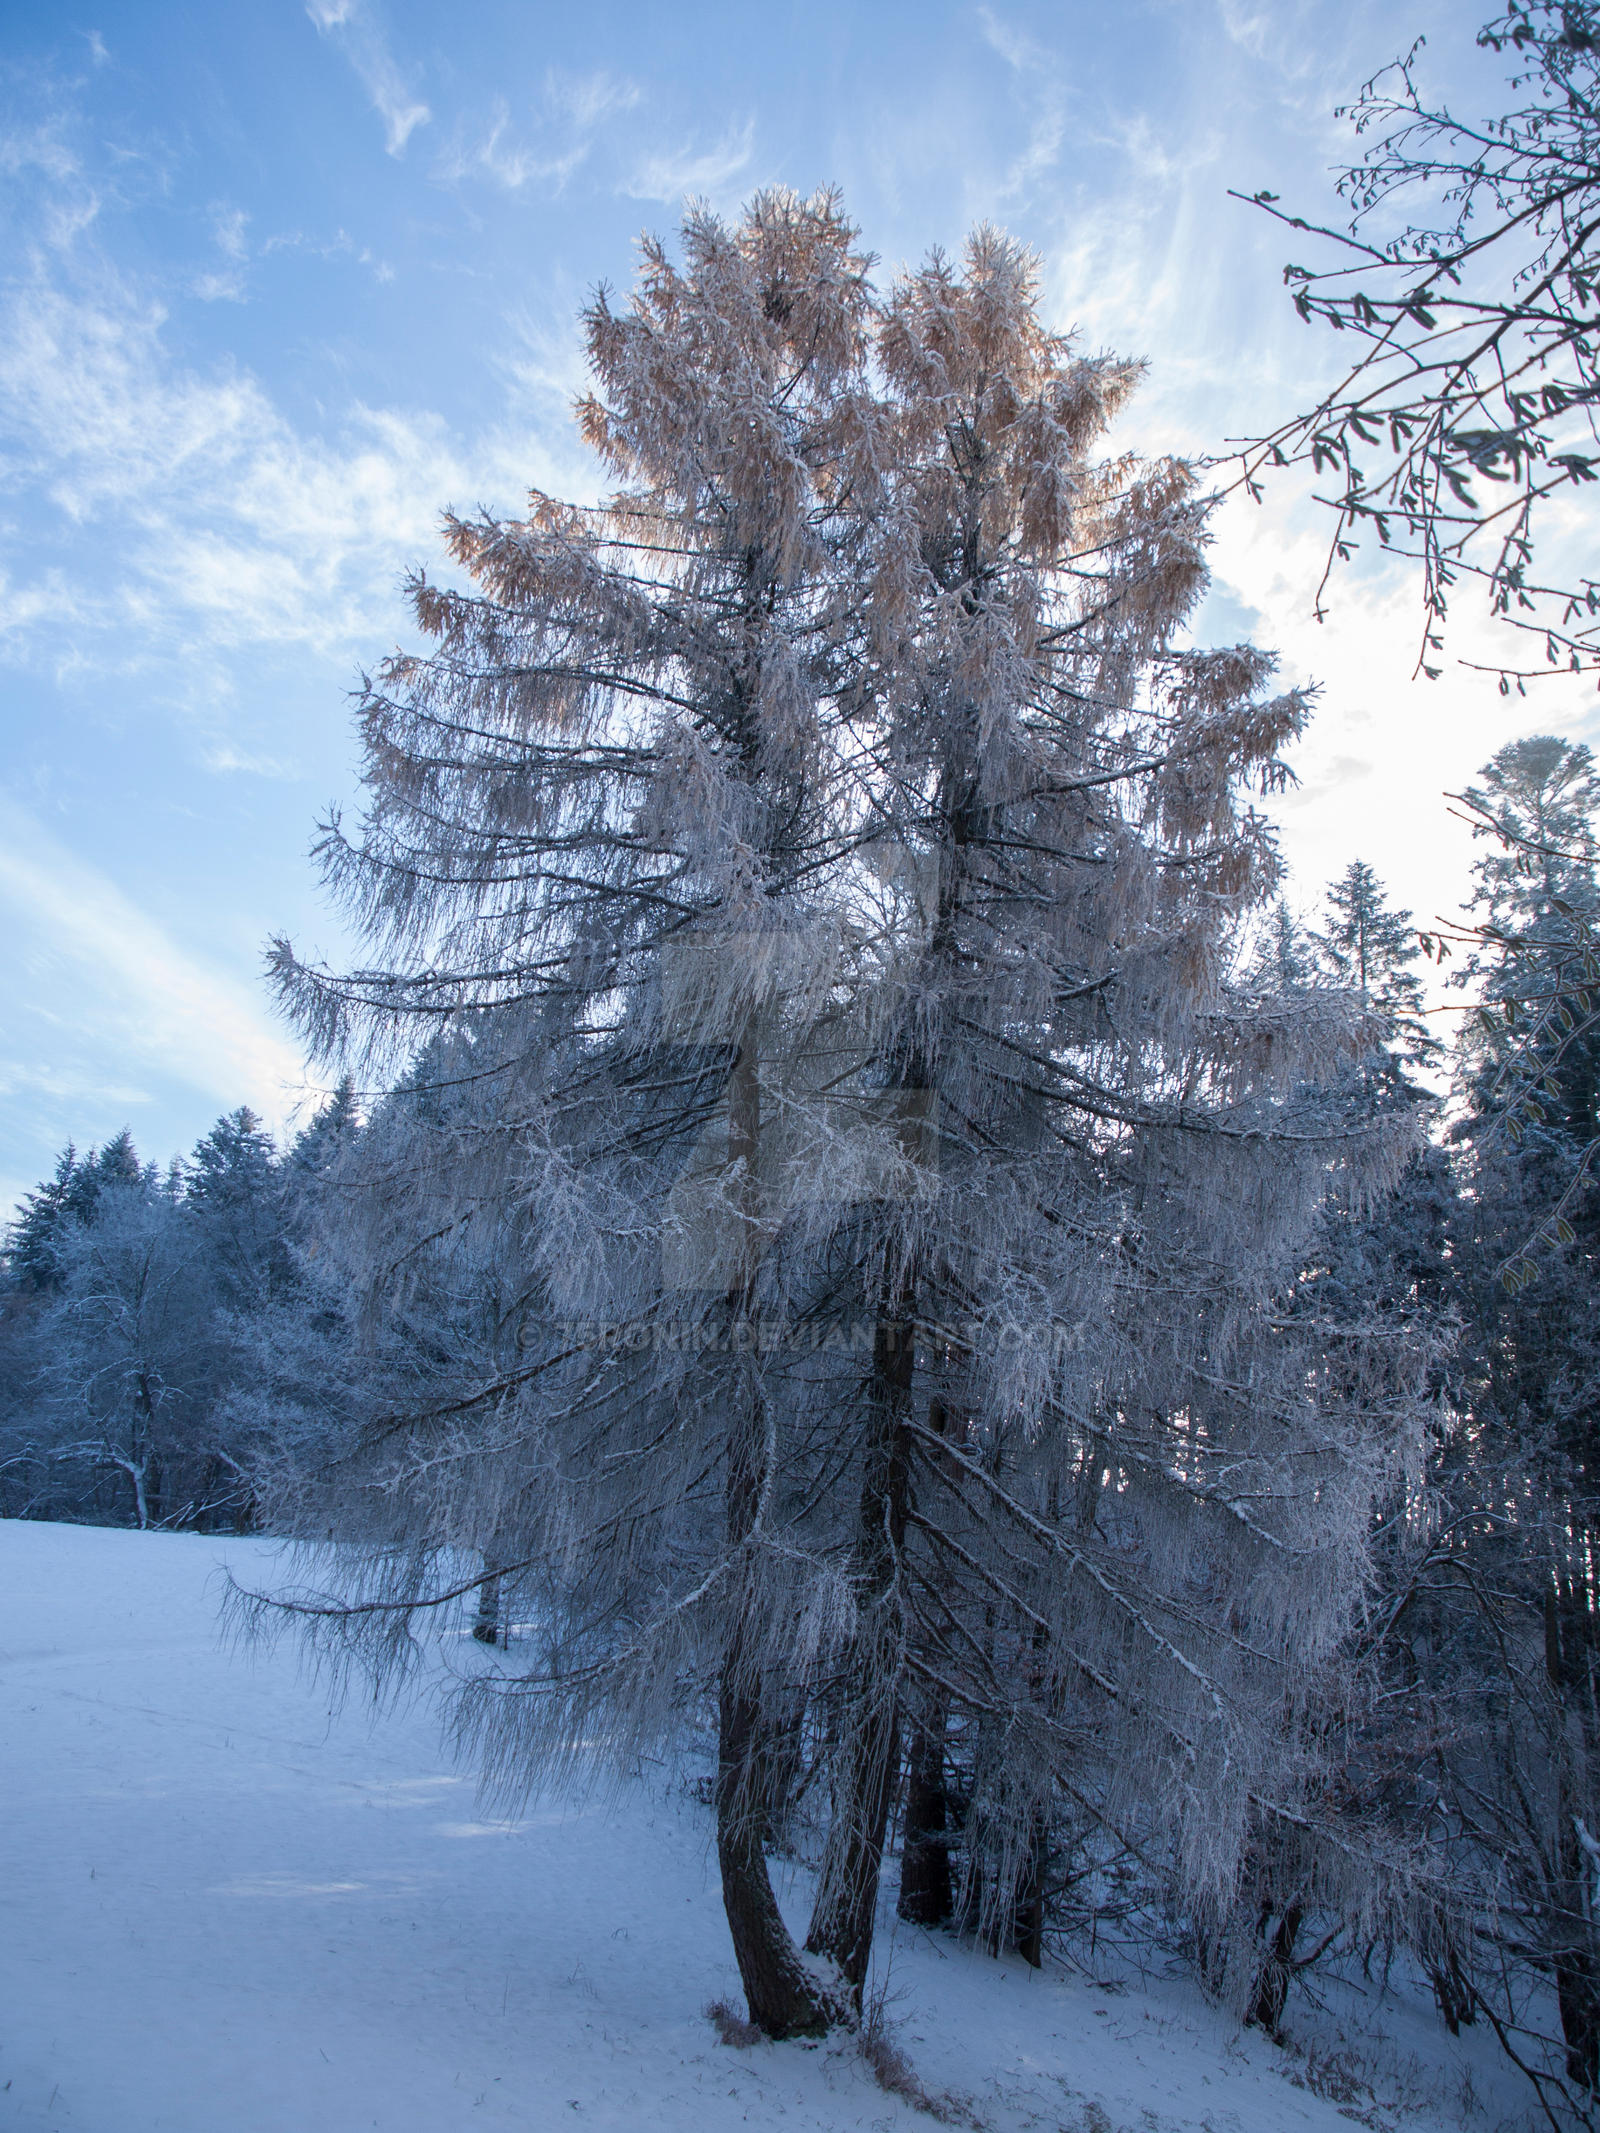 Snowy fir by 75ronin